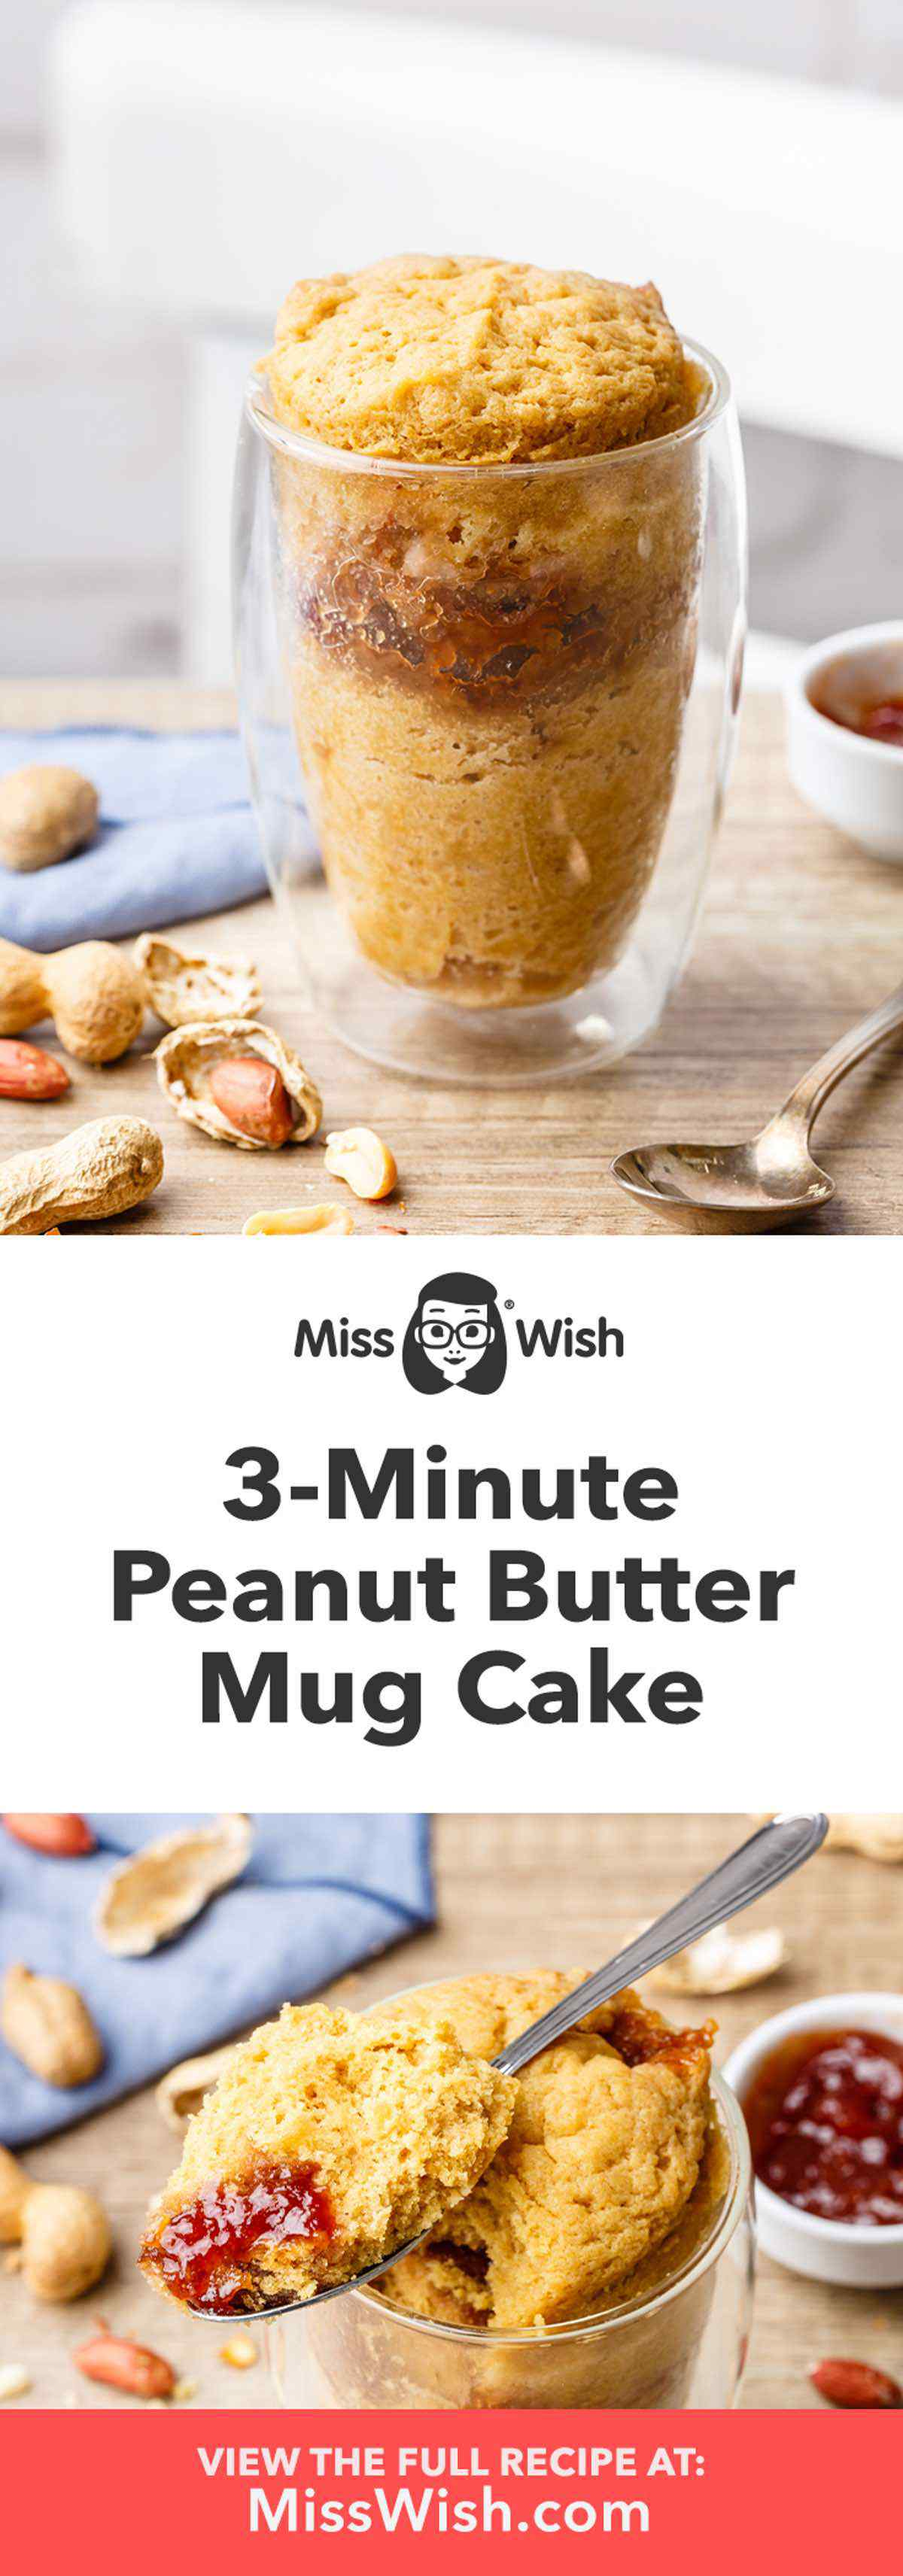 3-Minute Peanut Butter Mug Cake